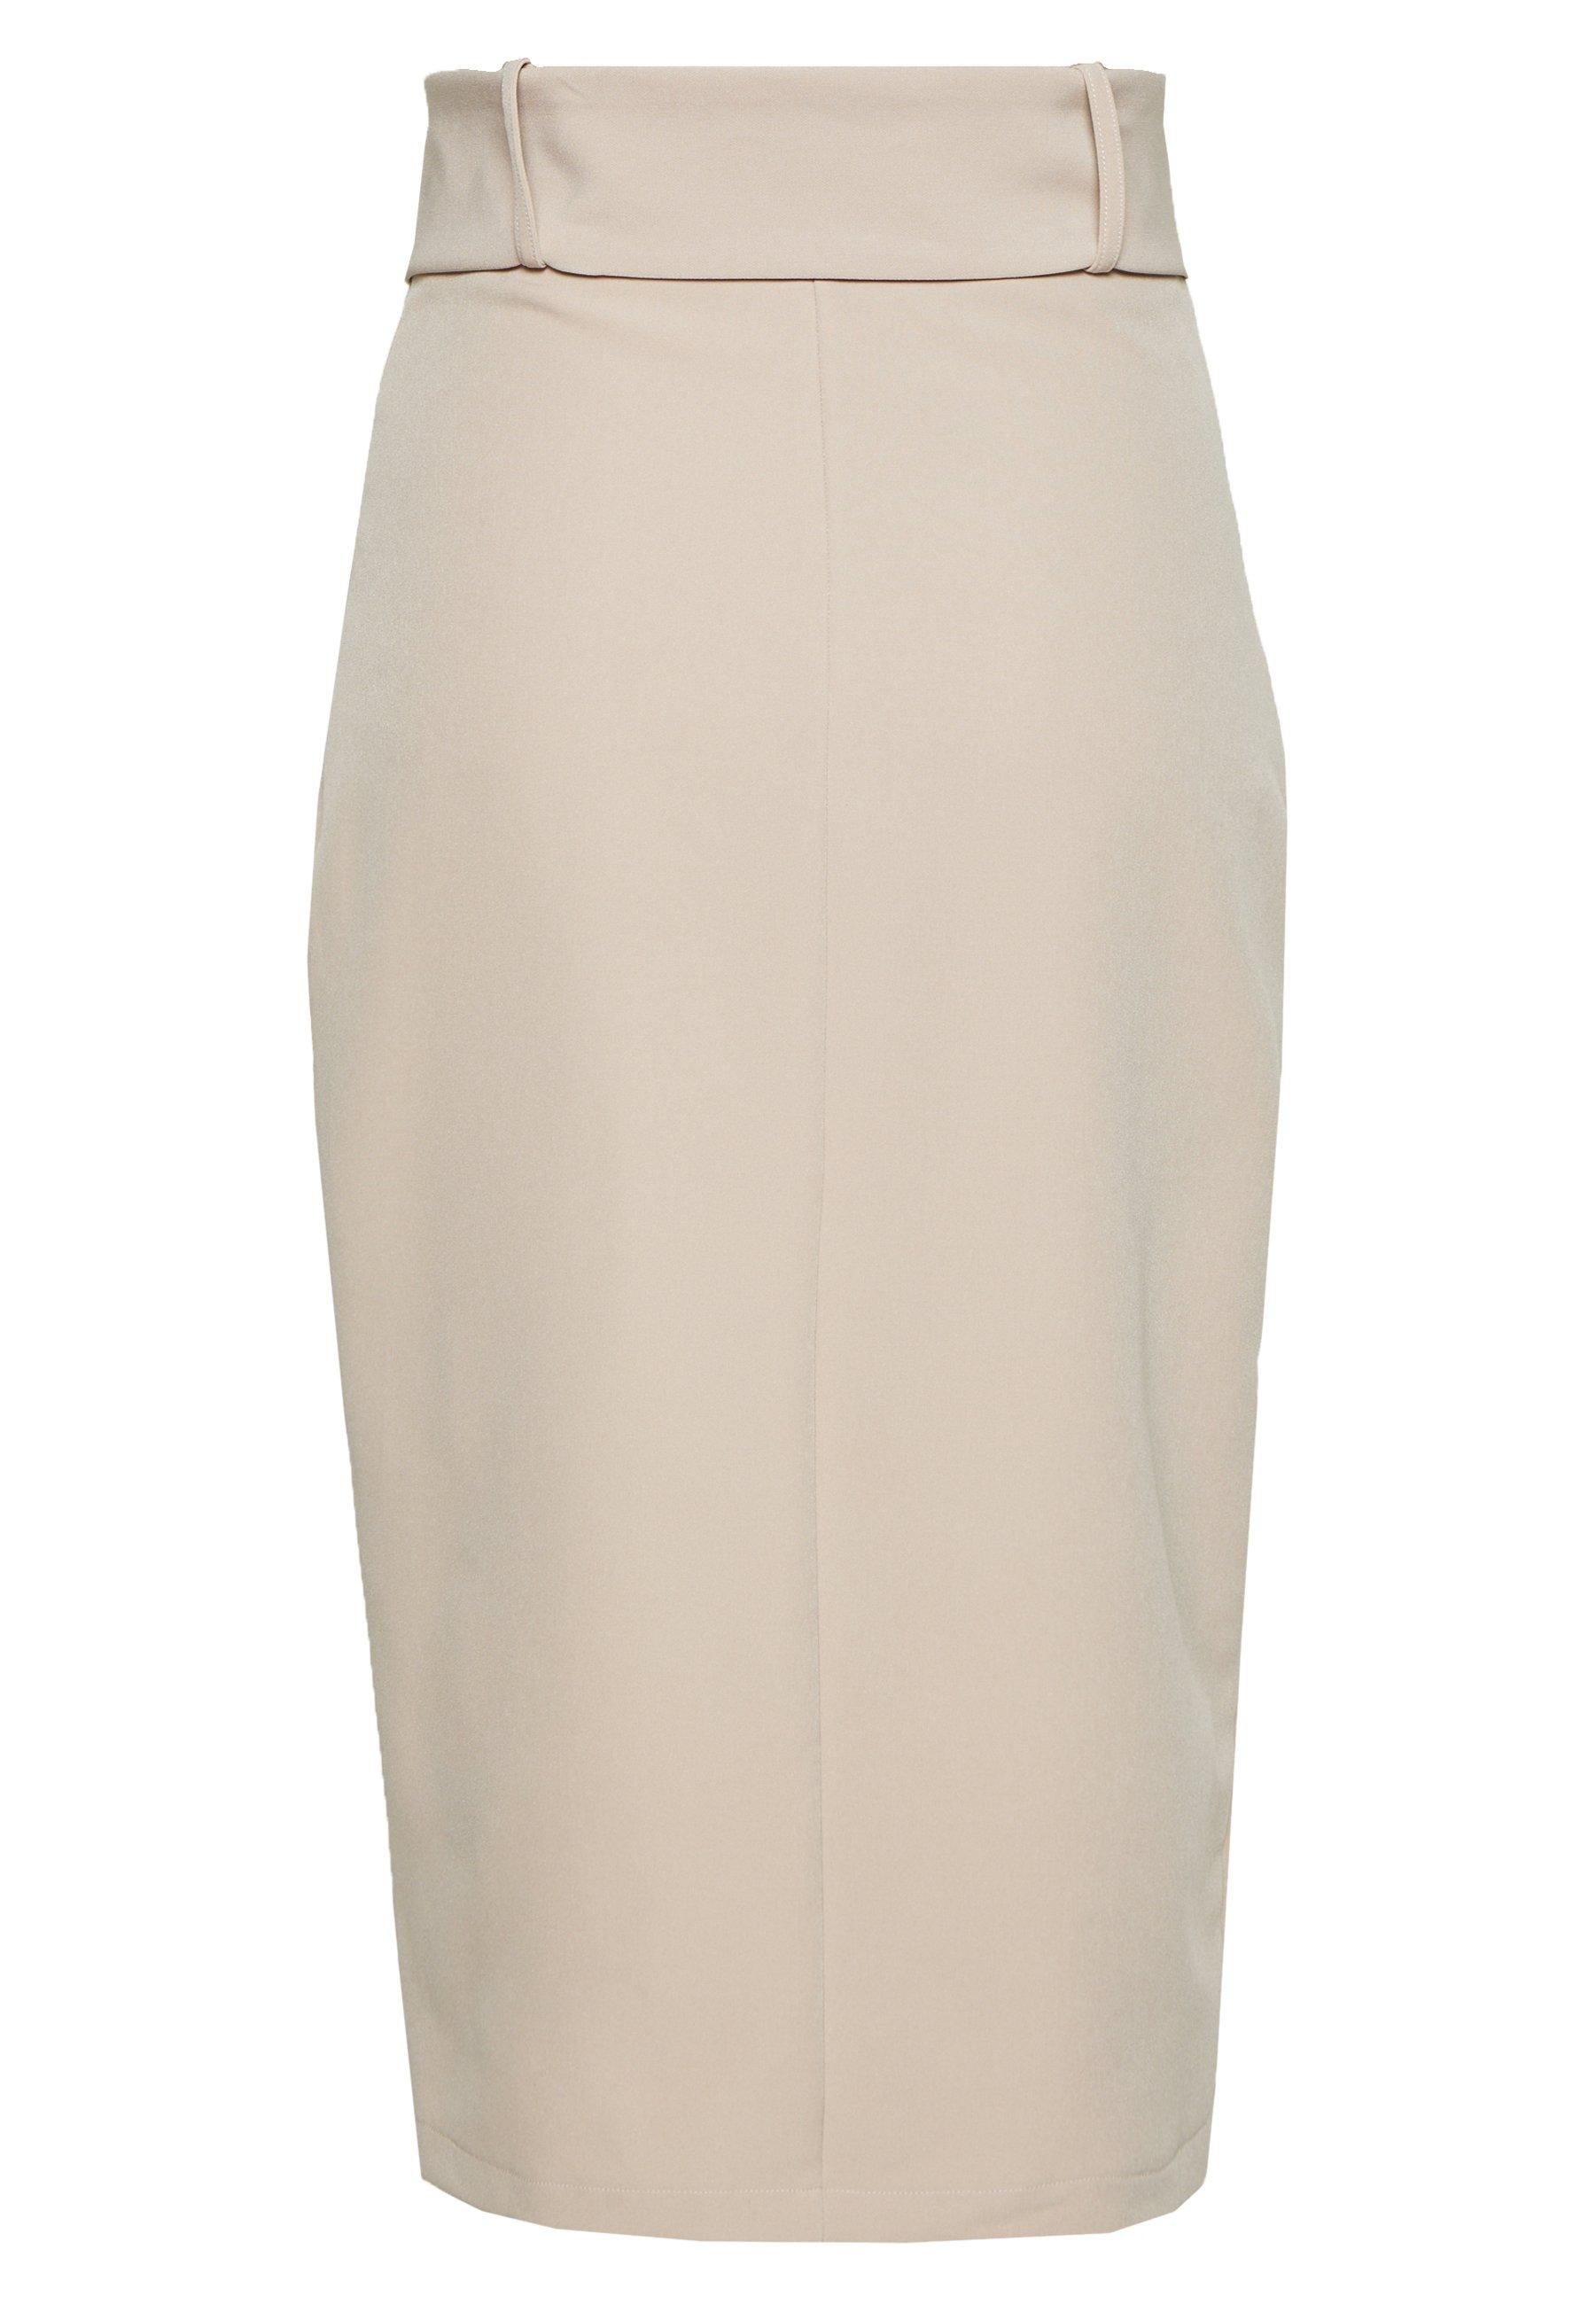 4th & Reckless Duchess Skirt - Mini Nude Pink